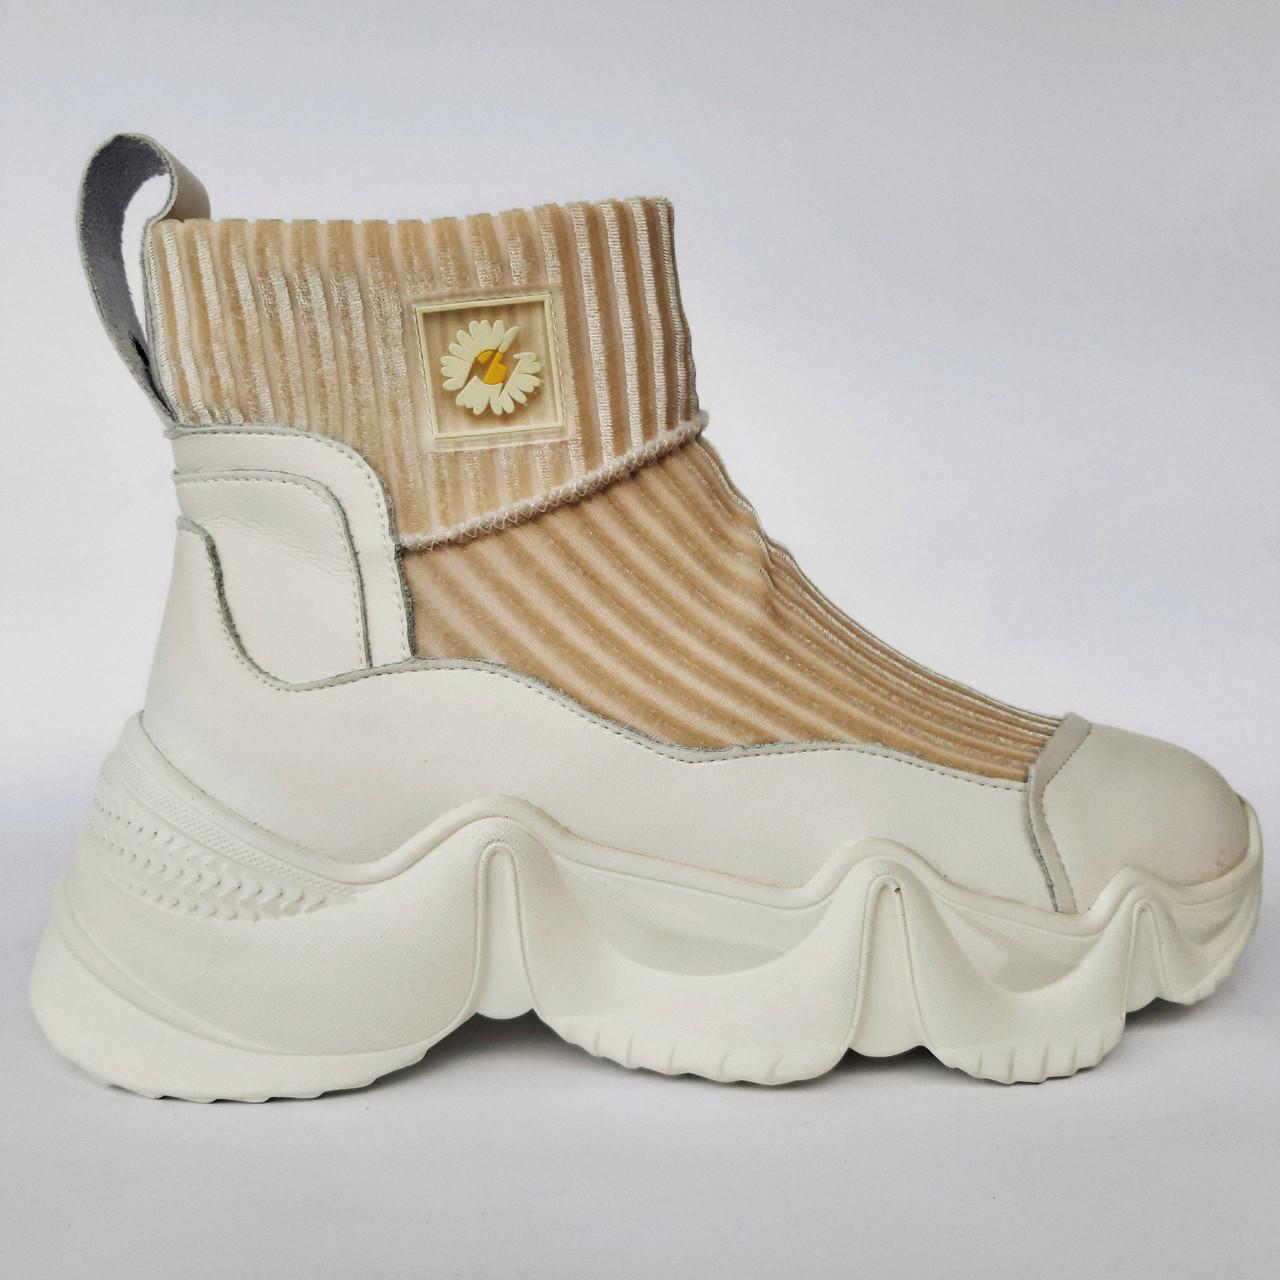 Ботинки женские демисезонн беж Tomfrie 27114